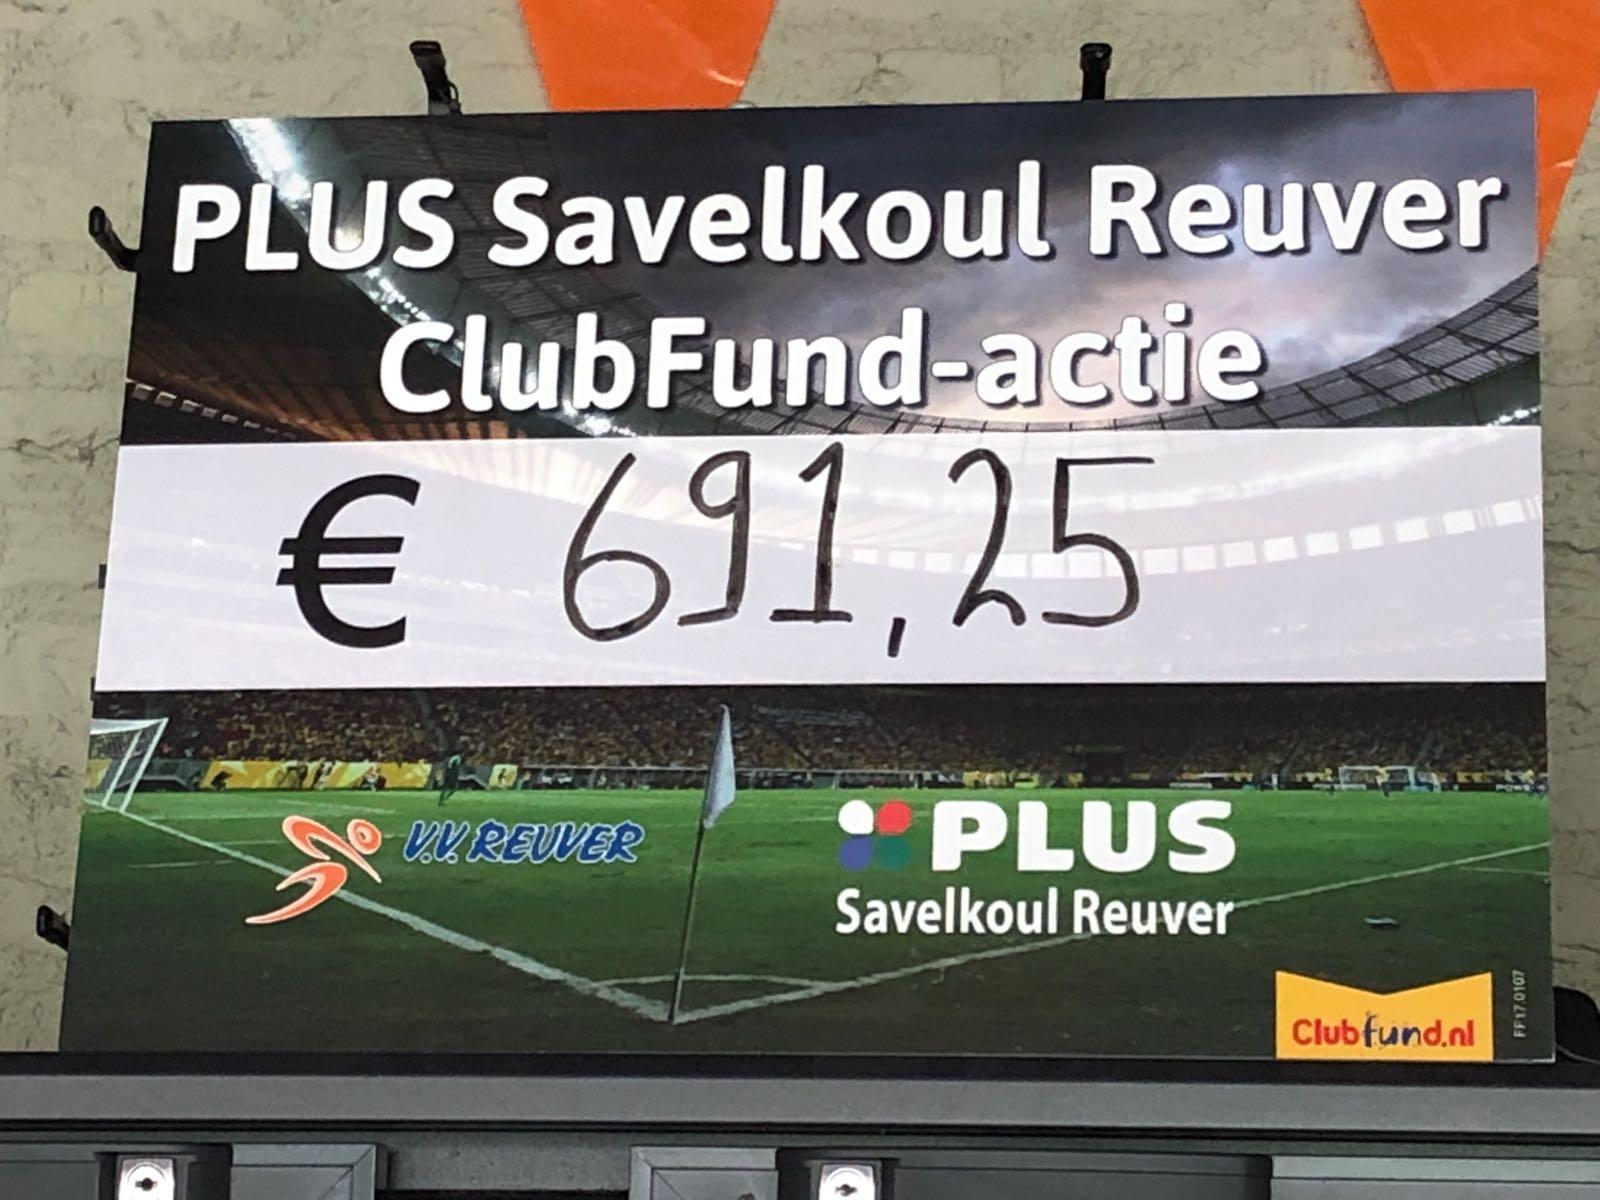 Clubfund-actie groot succes